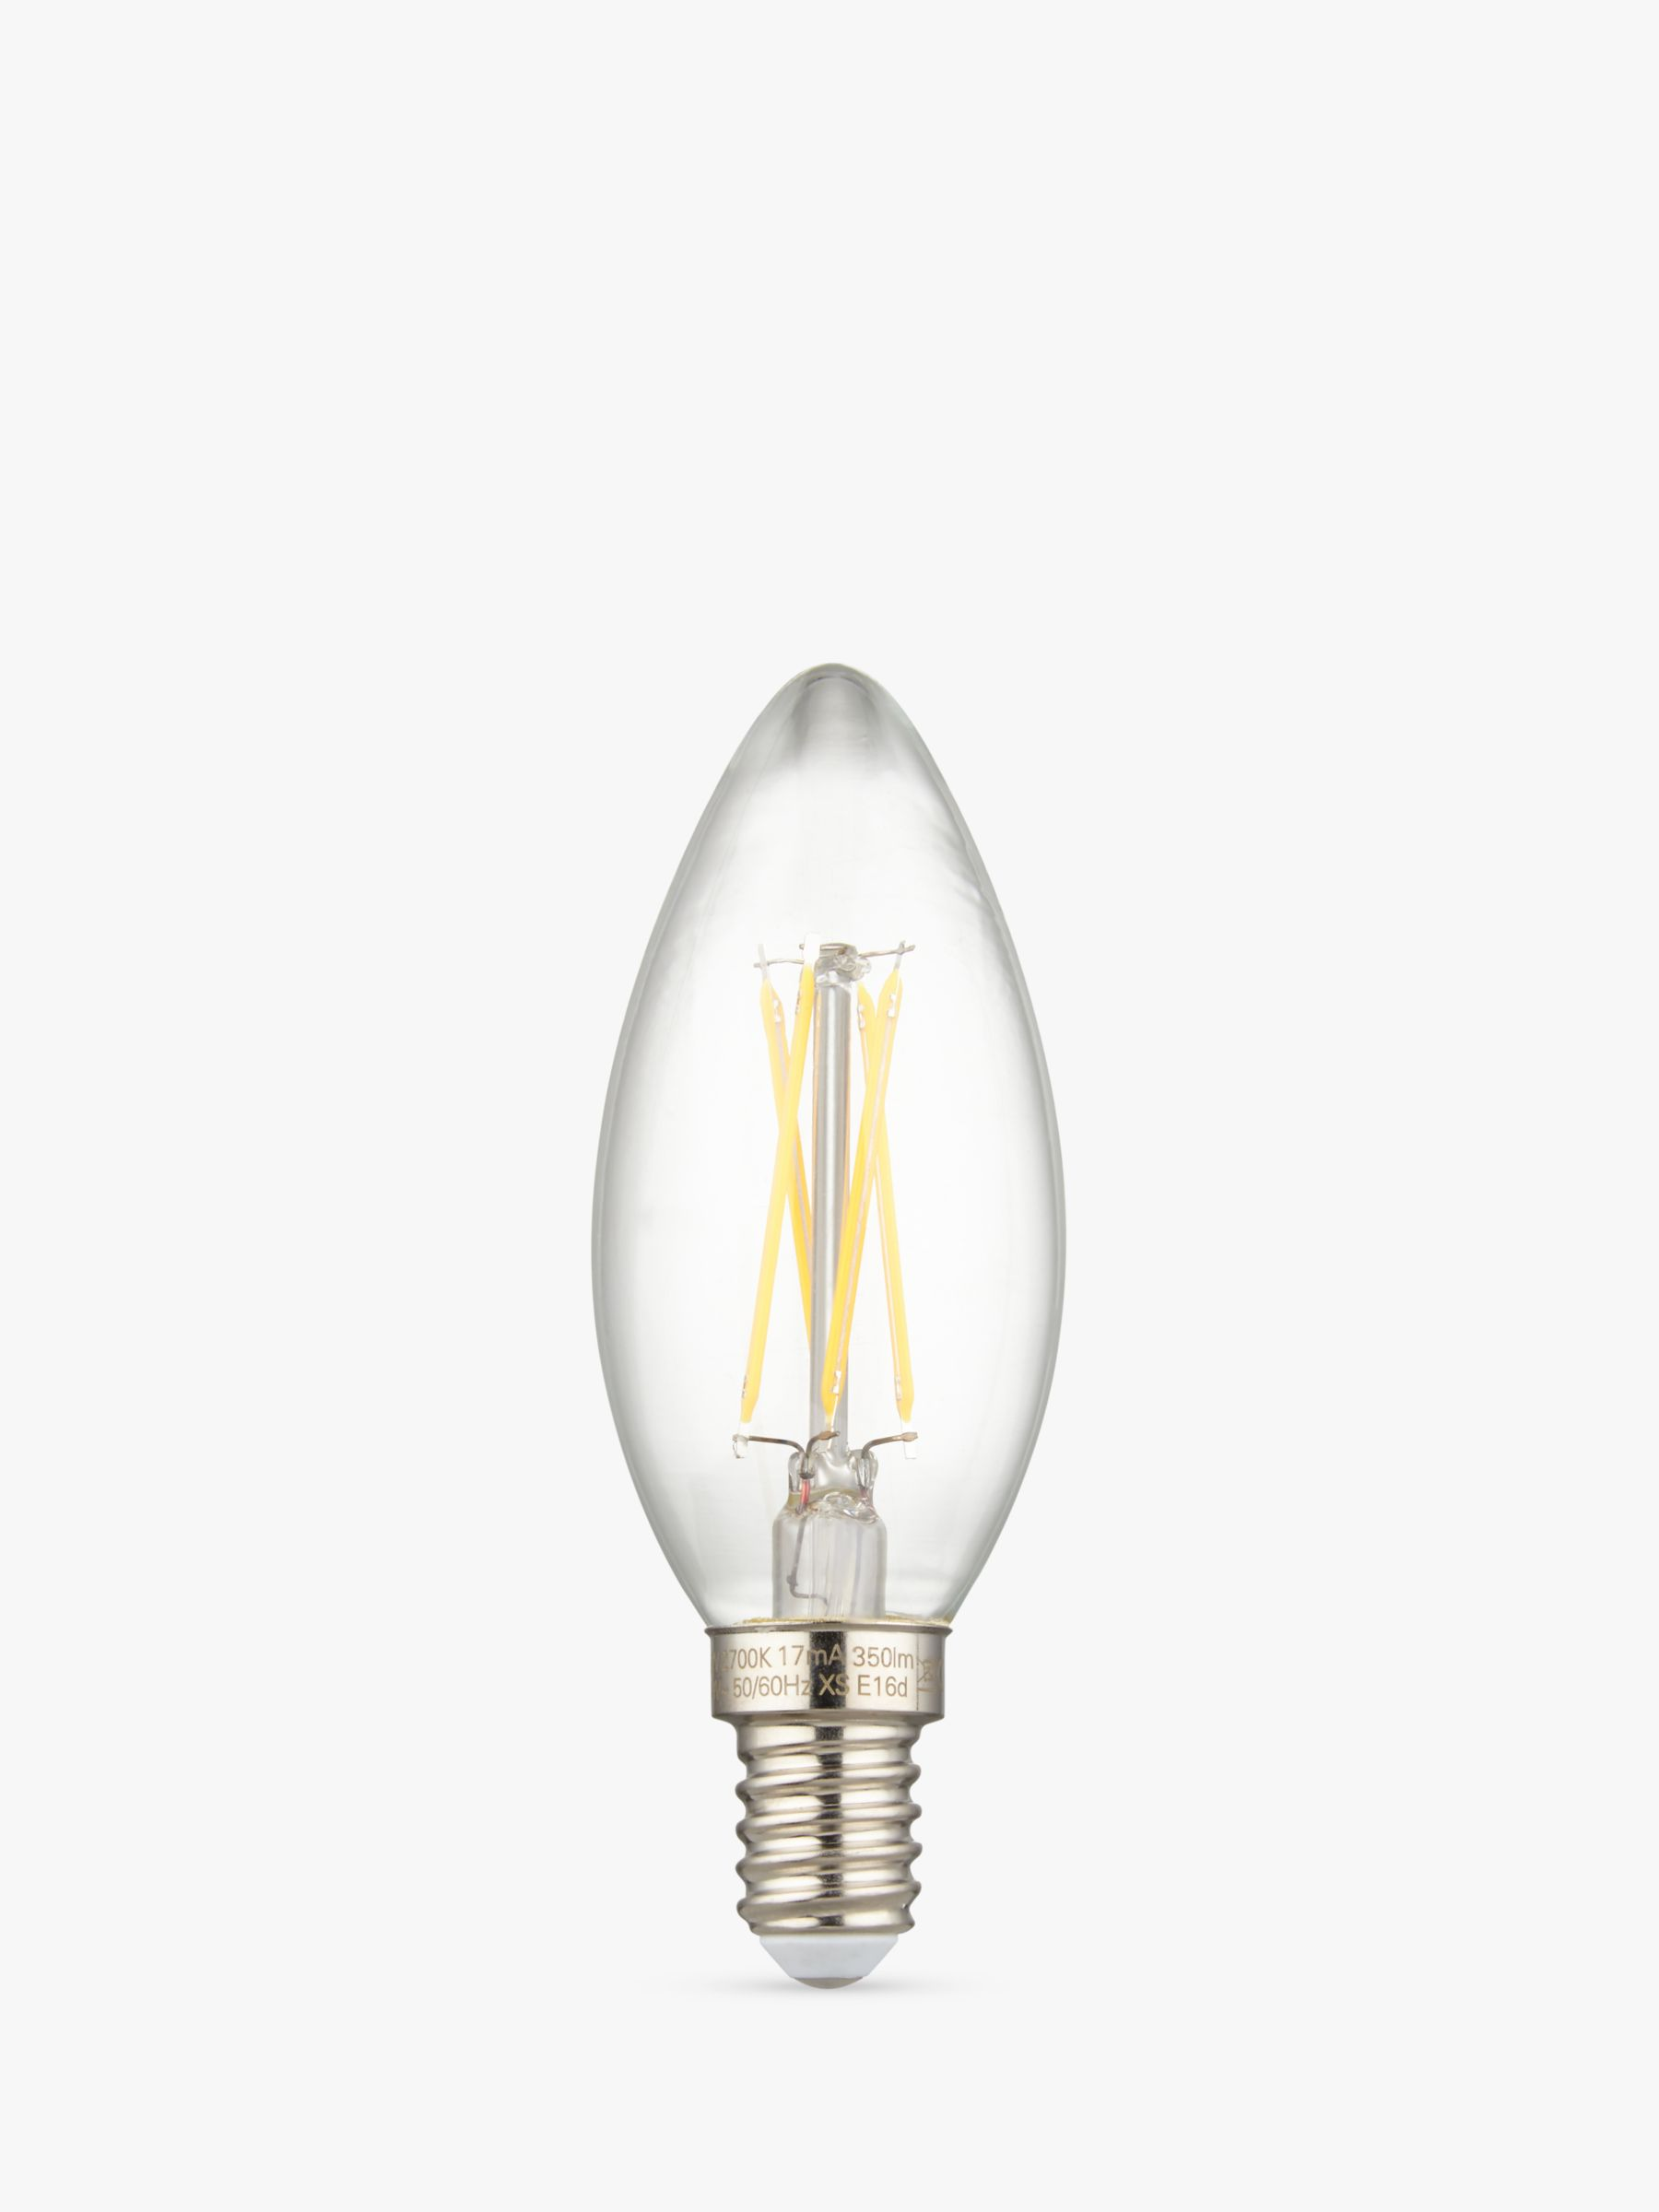 Calex Calex 3.5W SES LED Dimmble Filament Candle Bulb, Clear